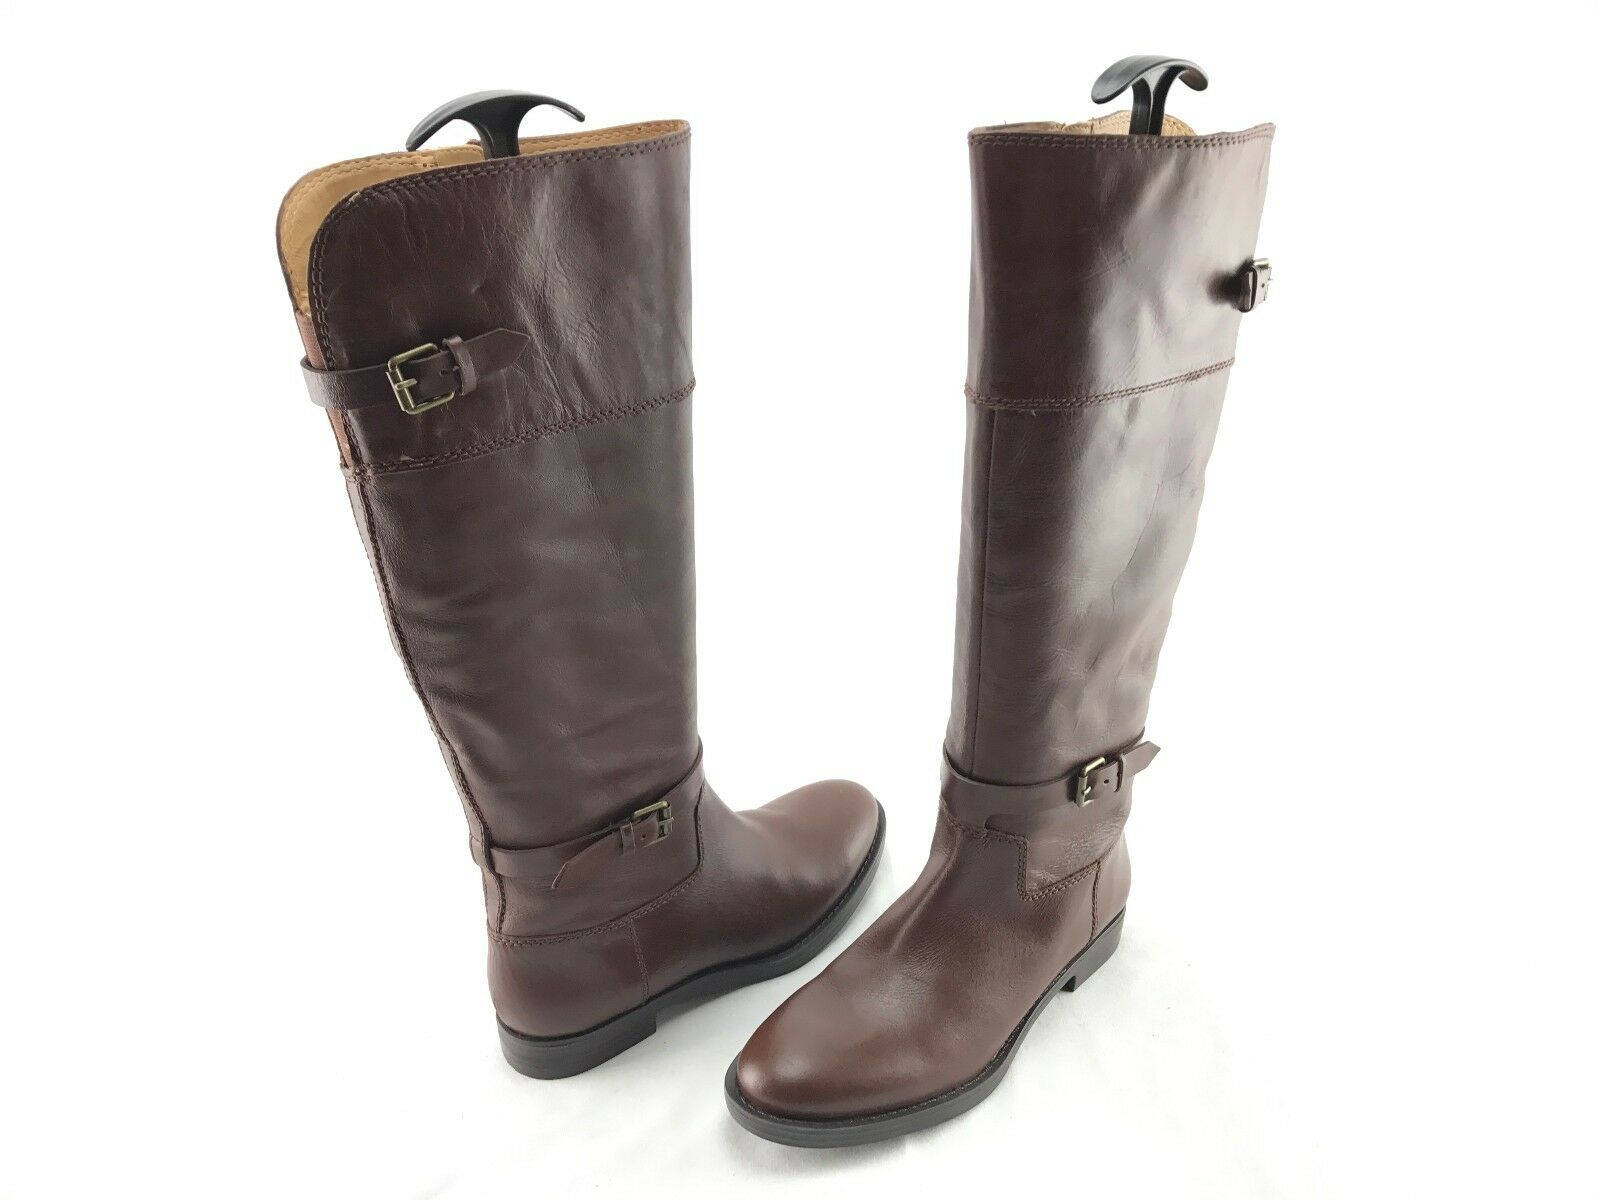 NEW Enzo Angiolini Eero Wouomo Marronee Leather Knee stivali US Dimensione 7 M scarpe  699